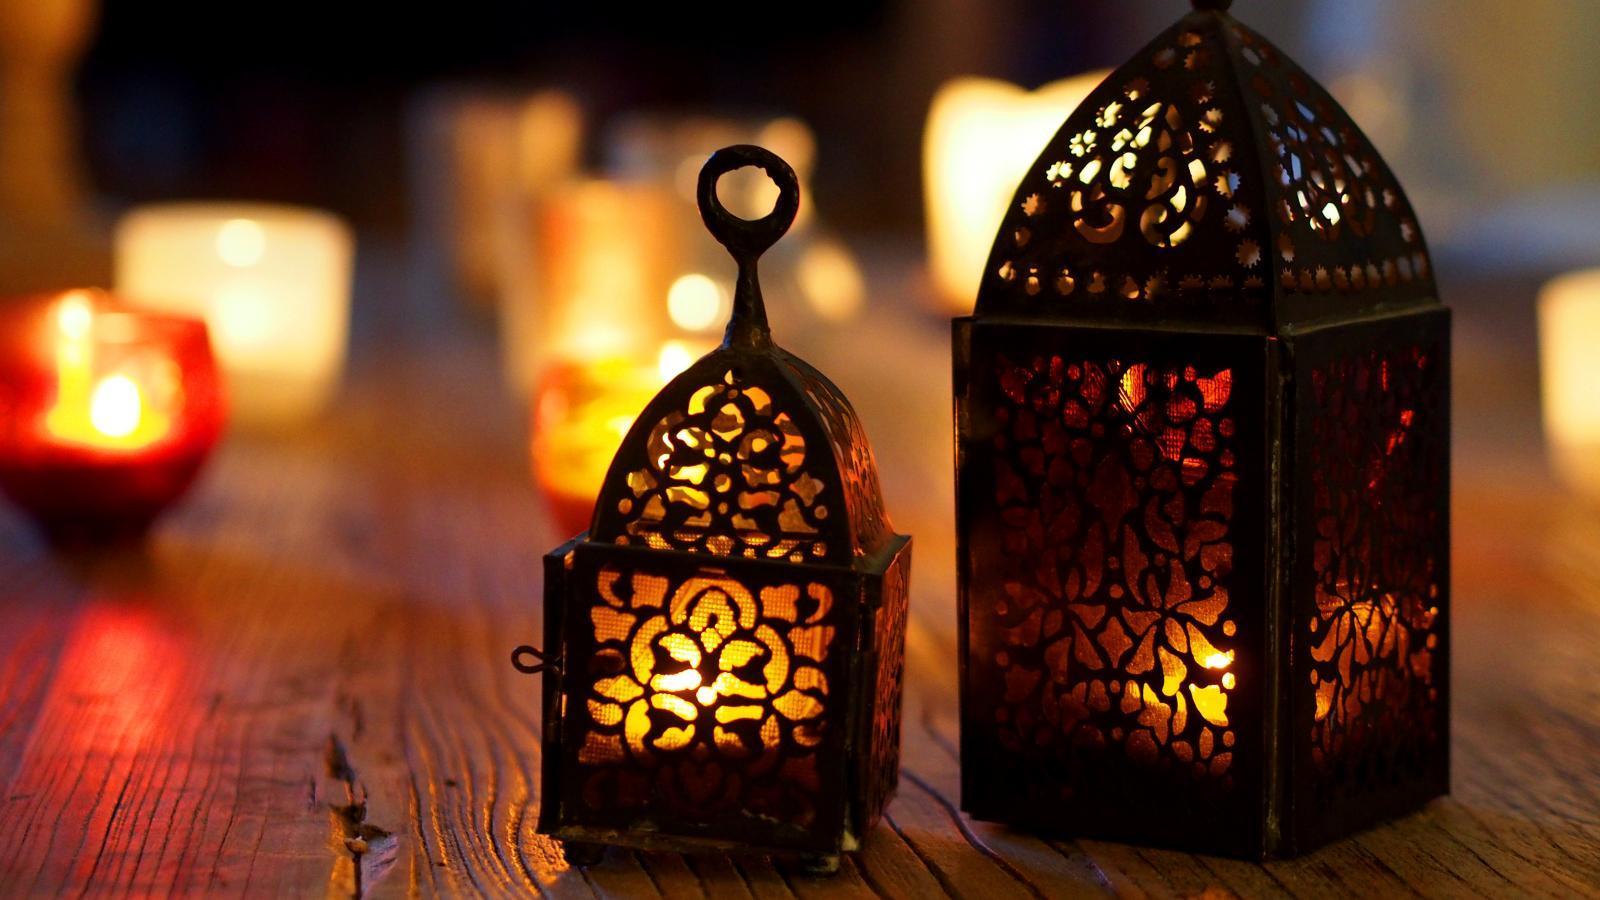 moroccan lamp 2 - صور فوانيس رمضان 2019, صور فوانيس رمضان خشب, صور فوانيس رمضان مكتوب عليها الإسم